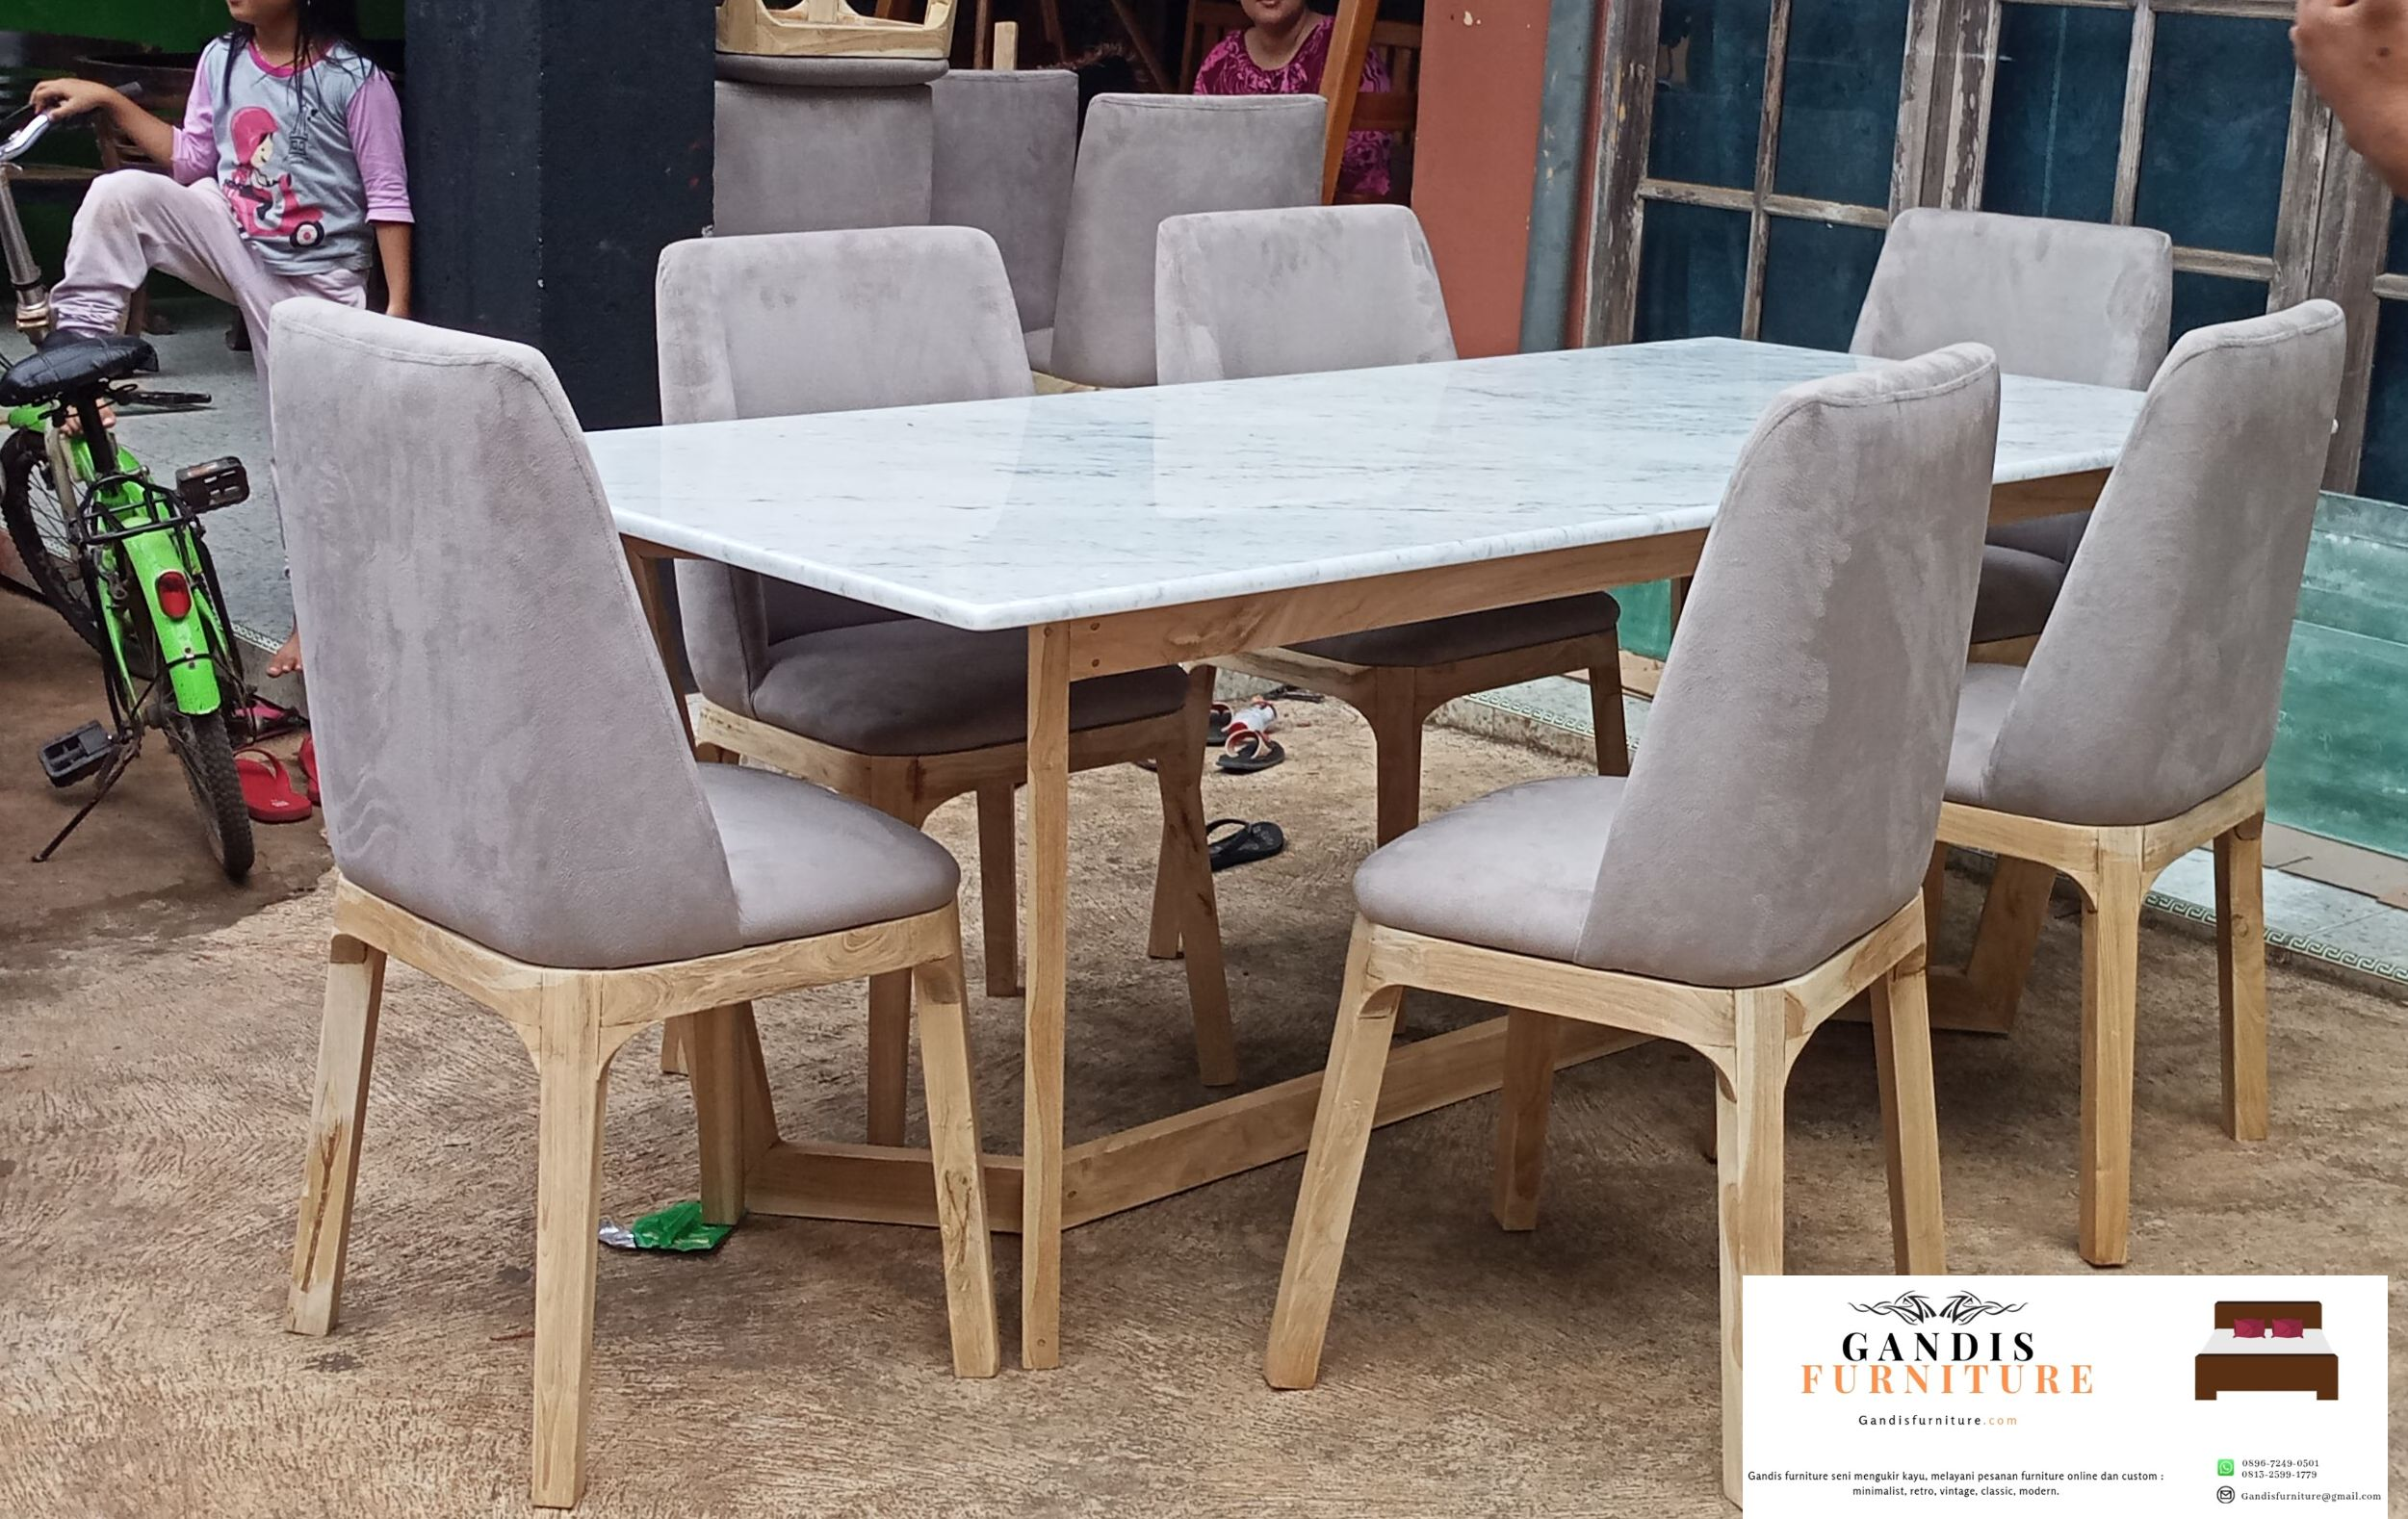 Gandis Furniture Jepara